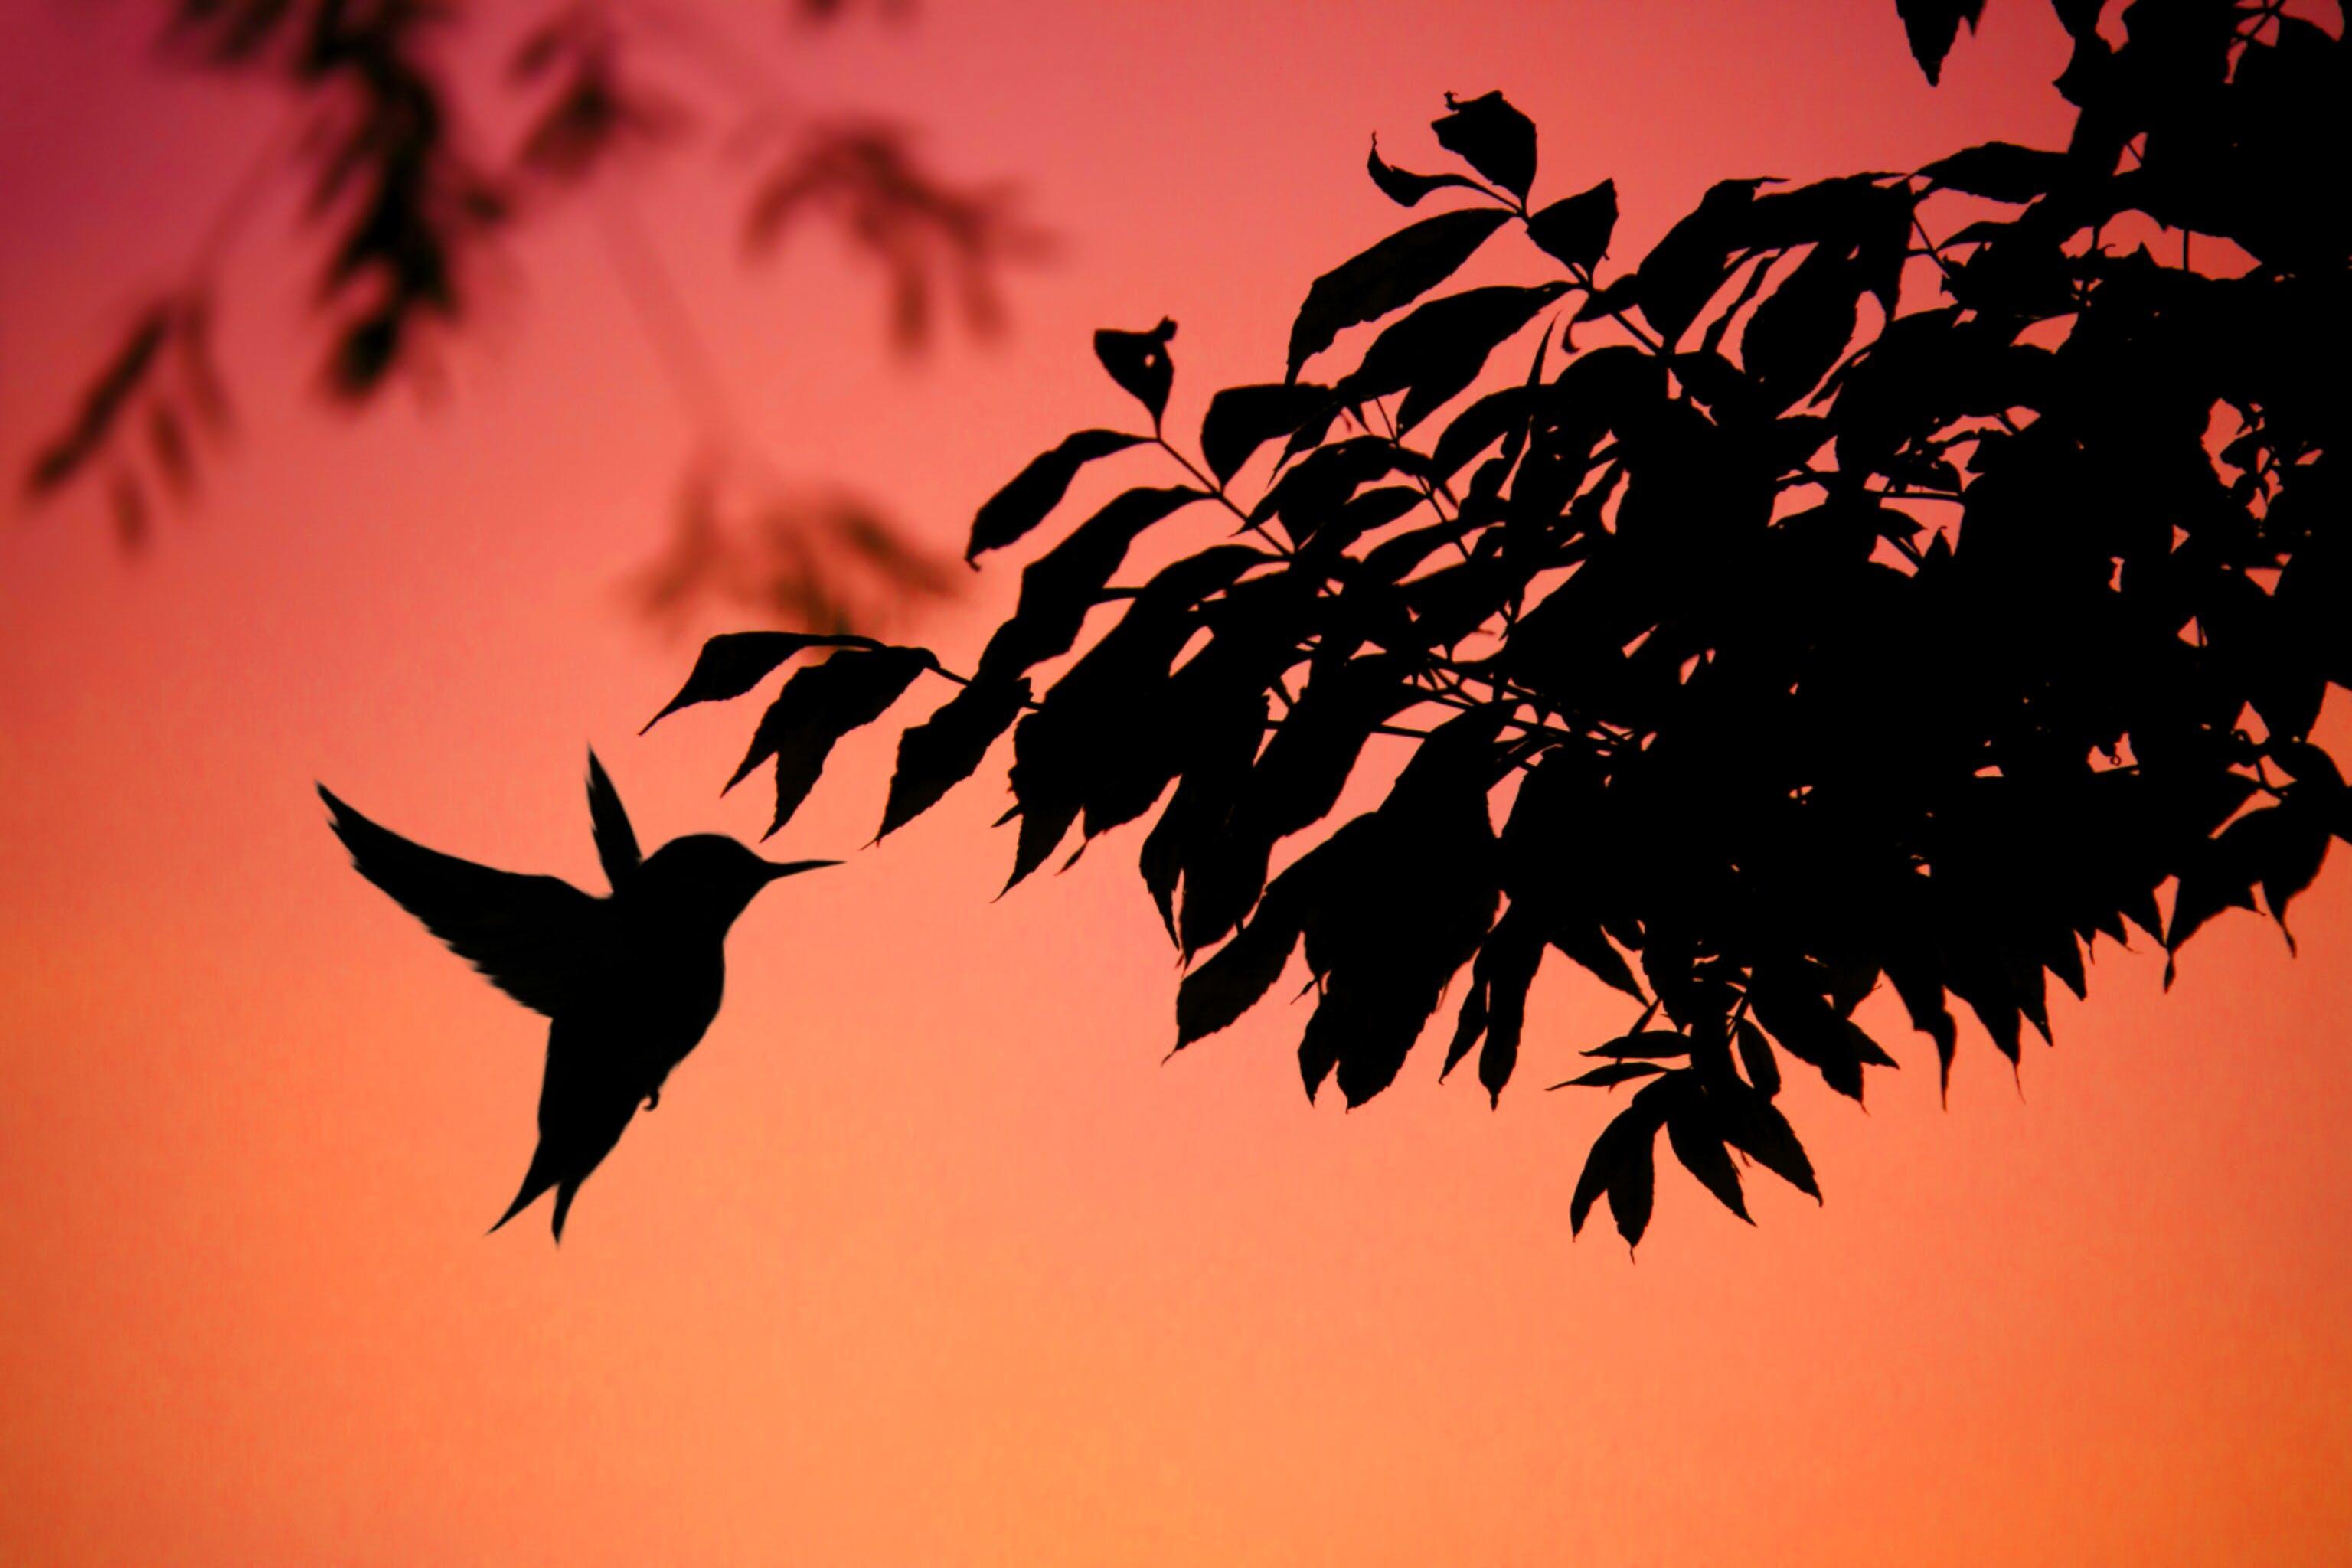 Silhouette Photo of Bird Flying Near Leaf